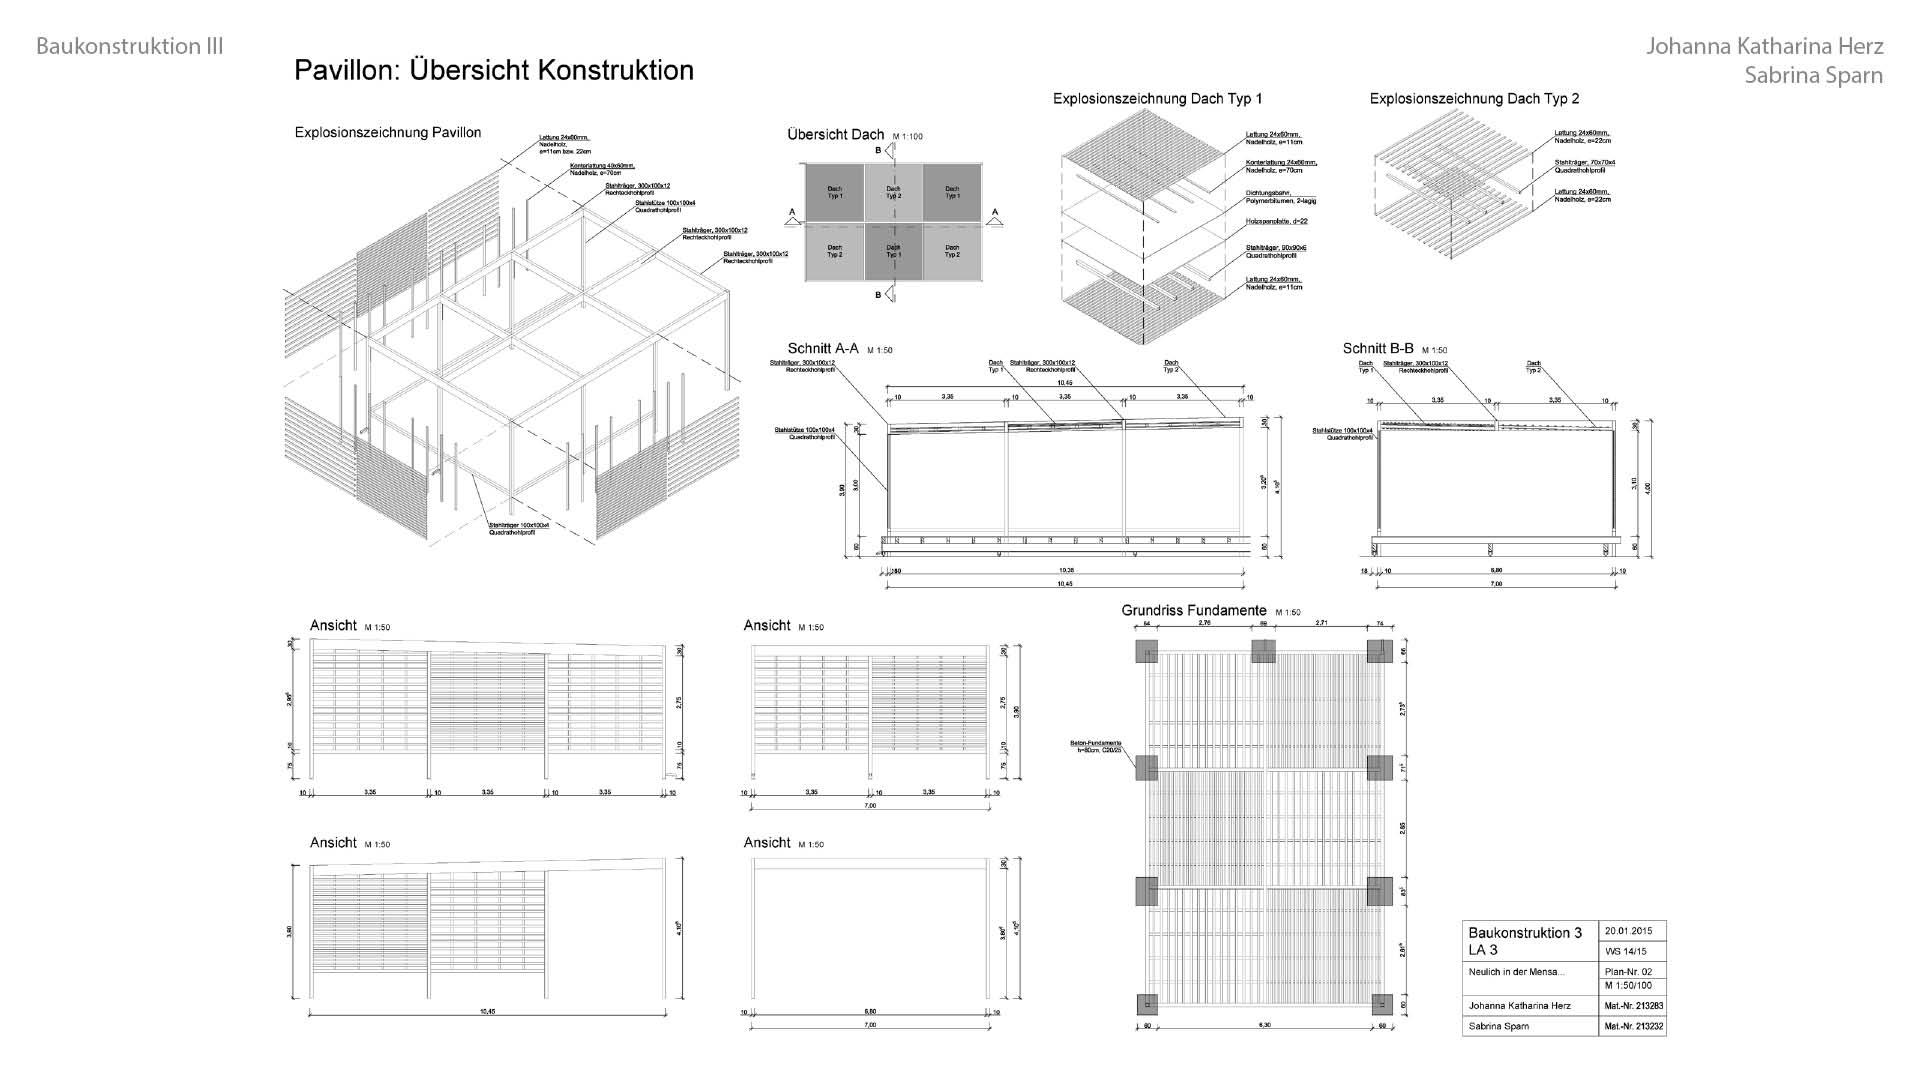 07 14 03 Baukonstruktion III